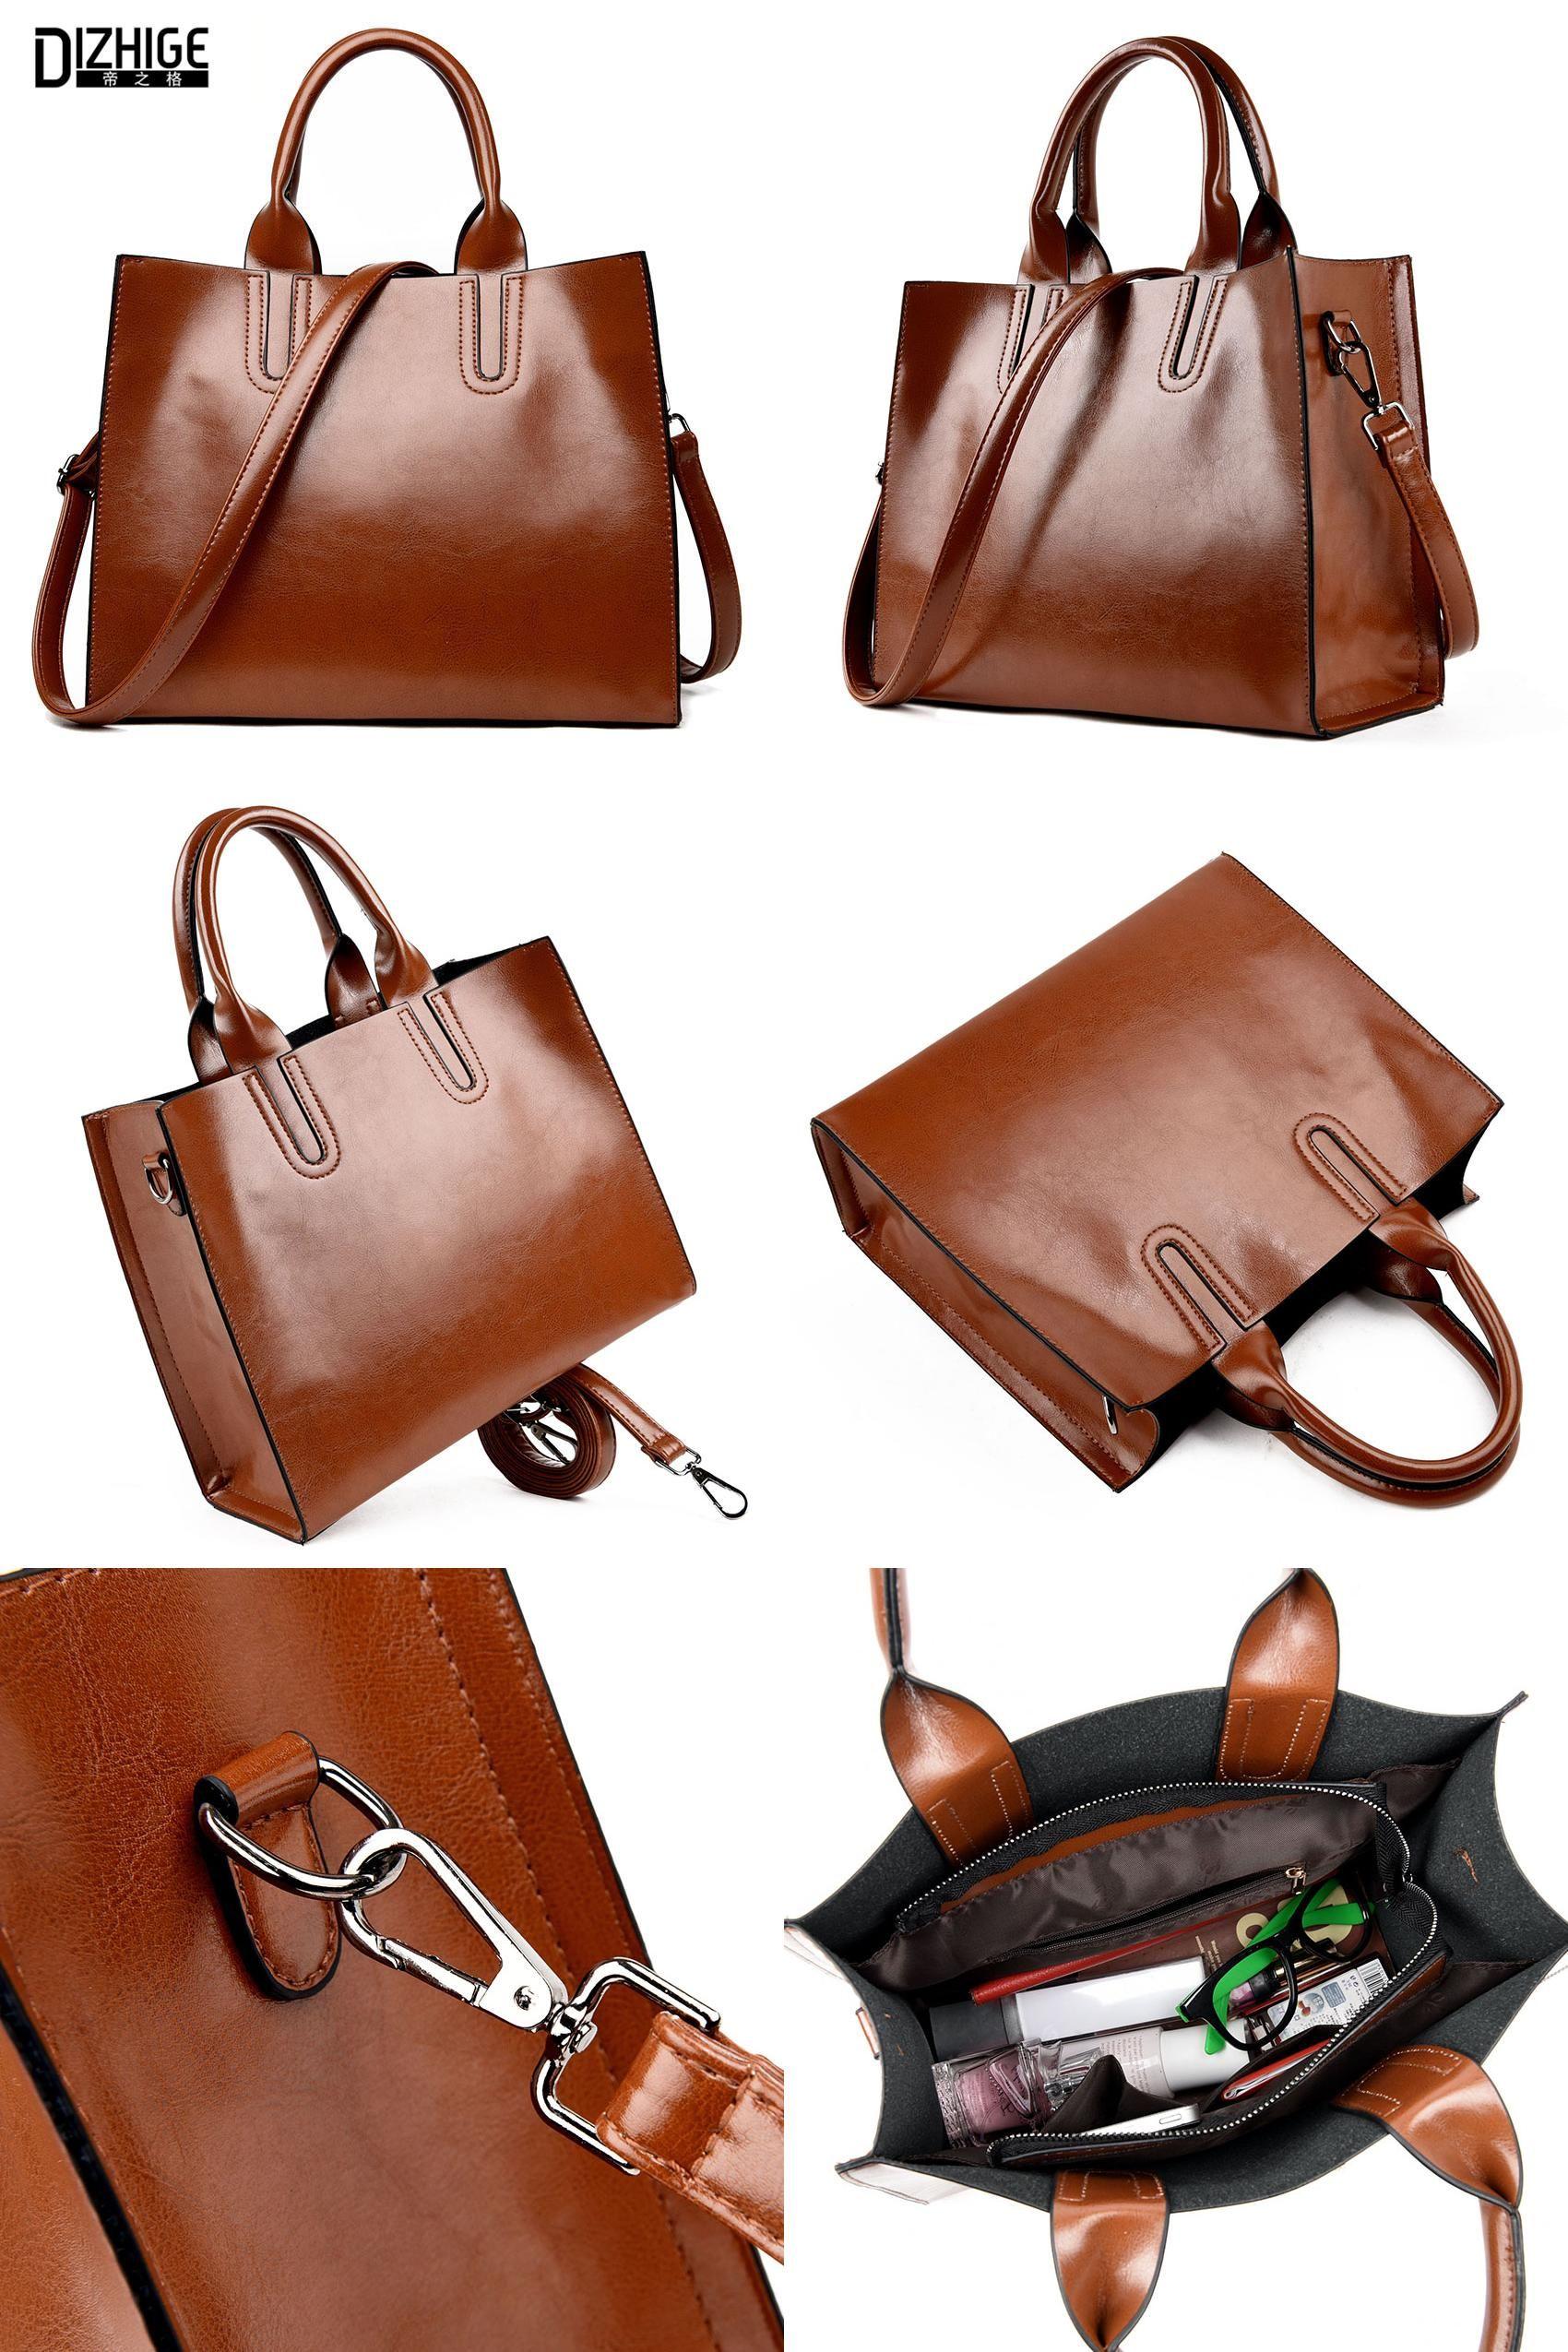 6701d7c4e2cbe  Visit to Buy  Trunk Luxury Handbags Women Bags Designer Pu Leather Bag  Famous Brand